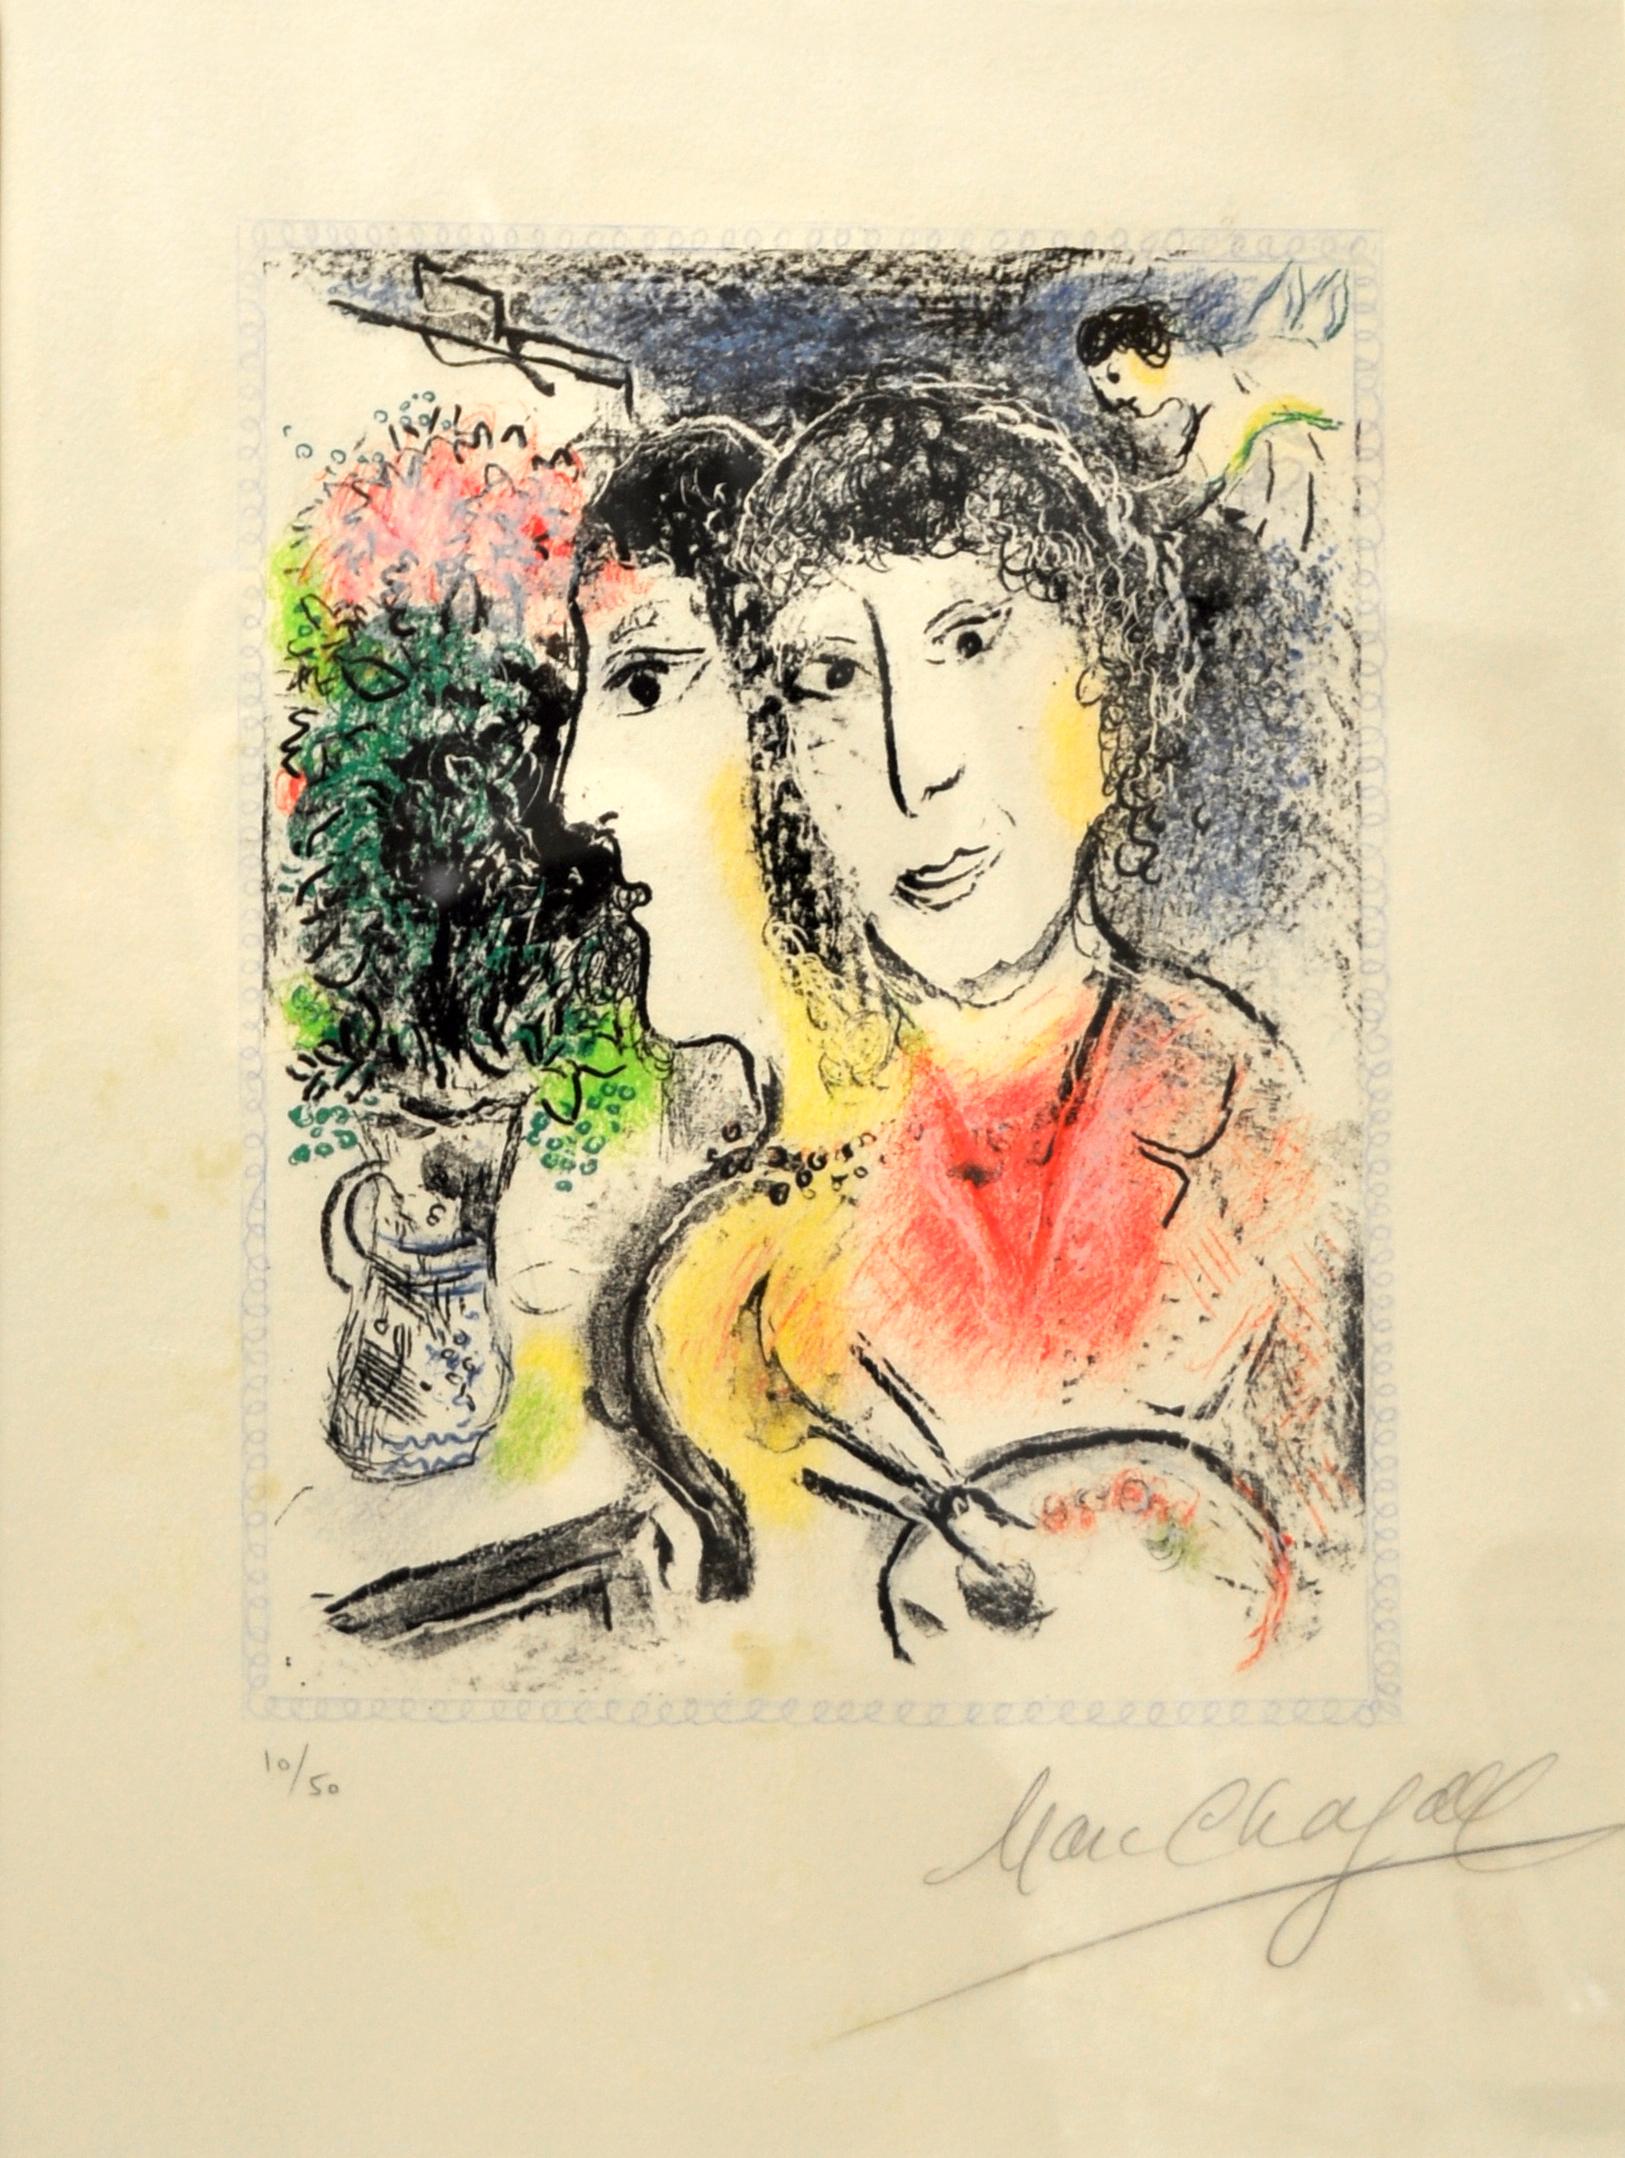 Marc Chagall - Doppelportrait an der Staffelei , 0610-008-402